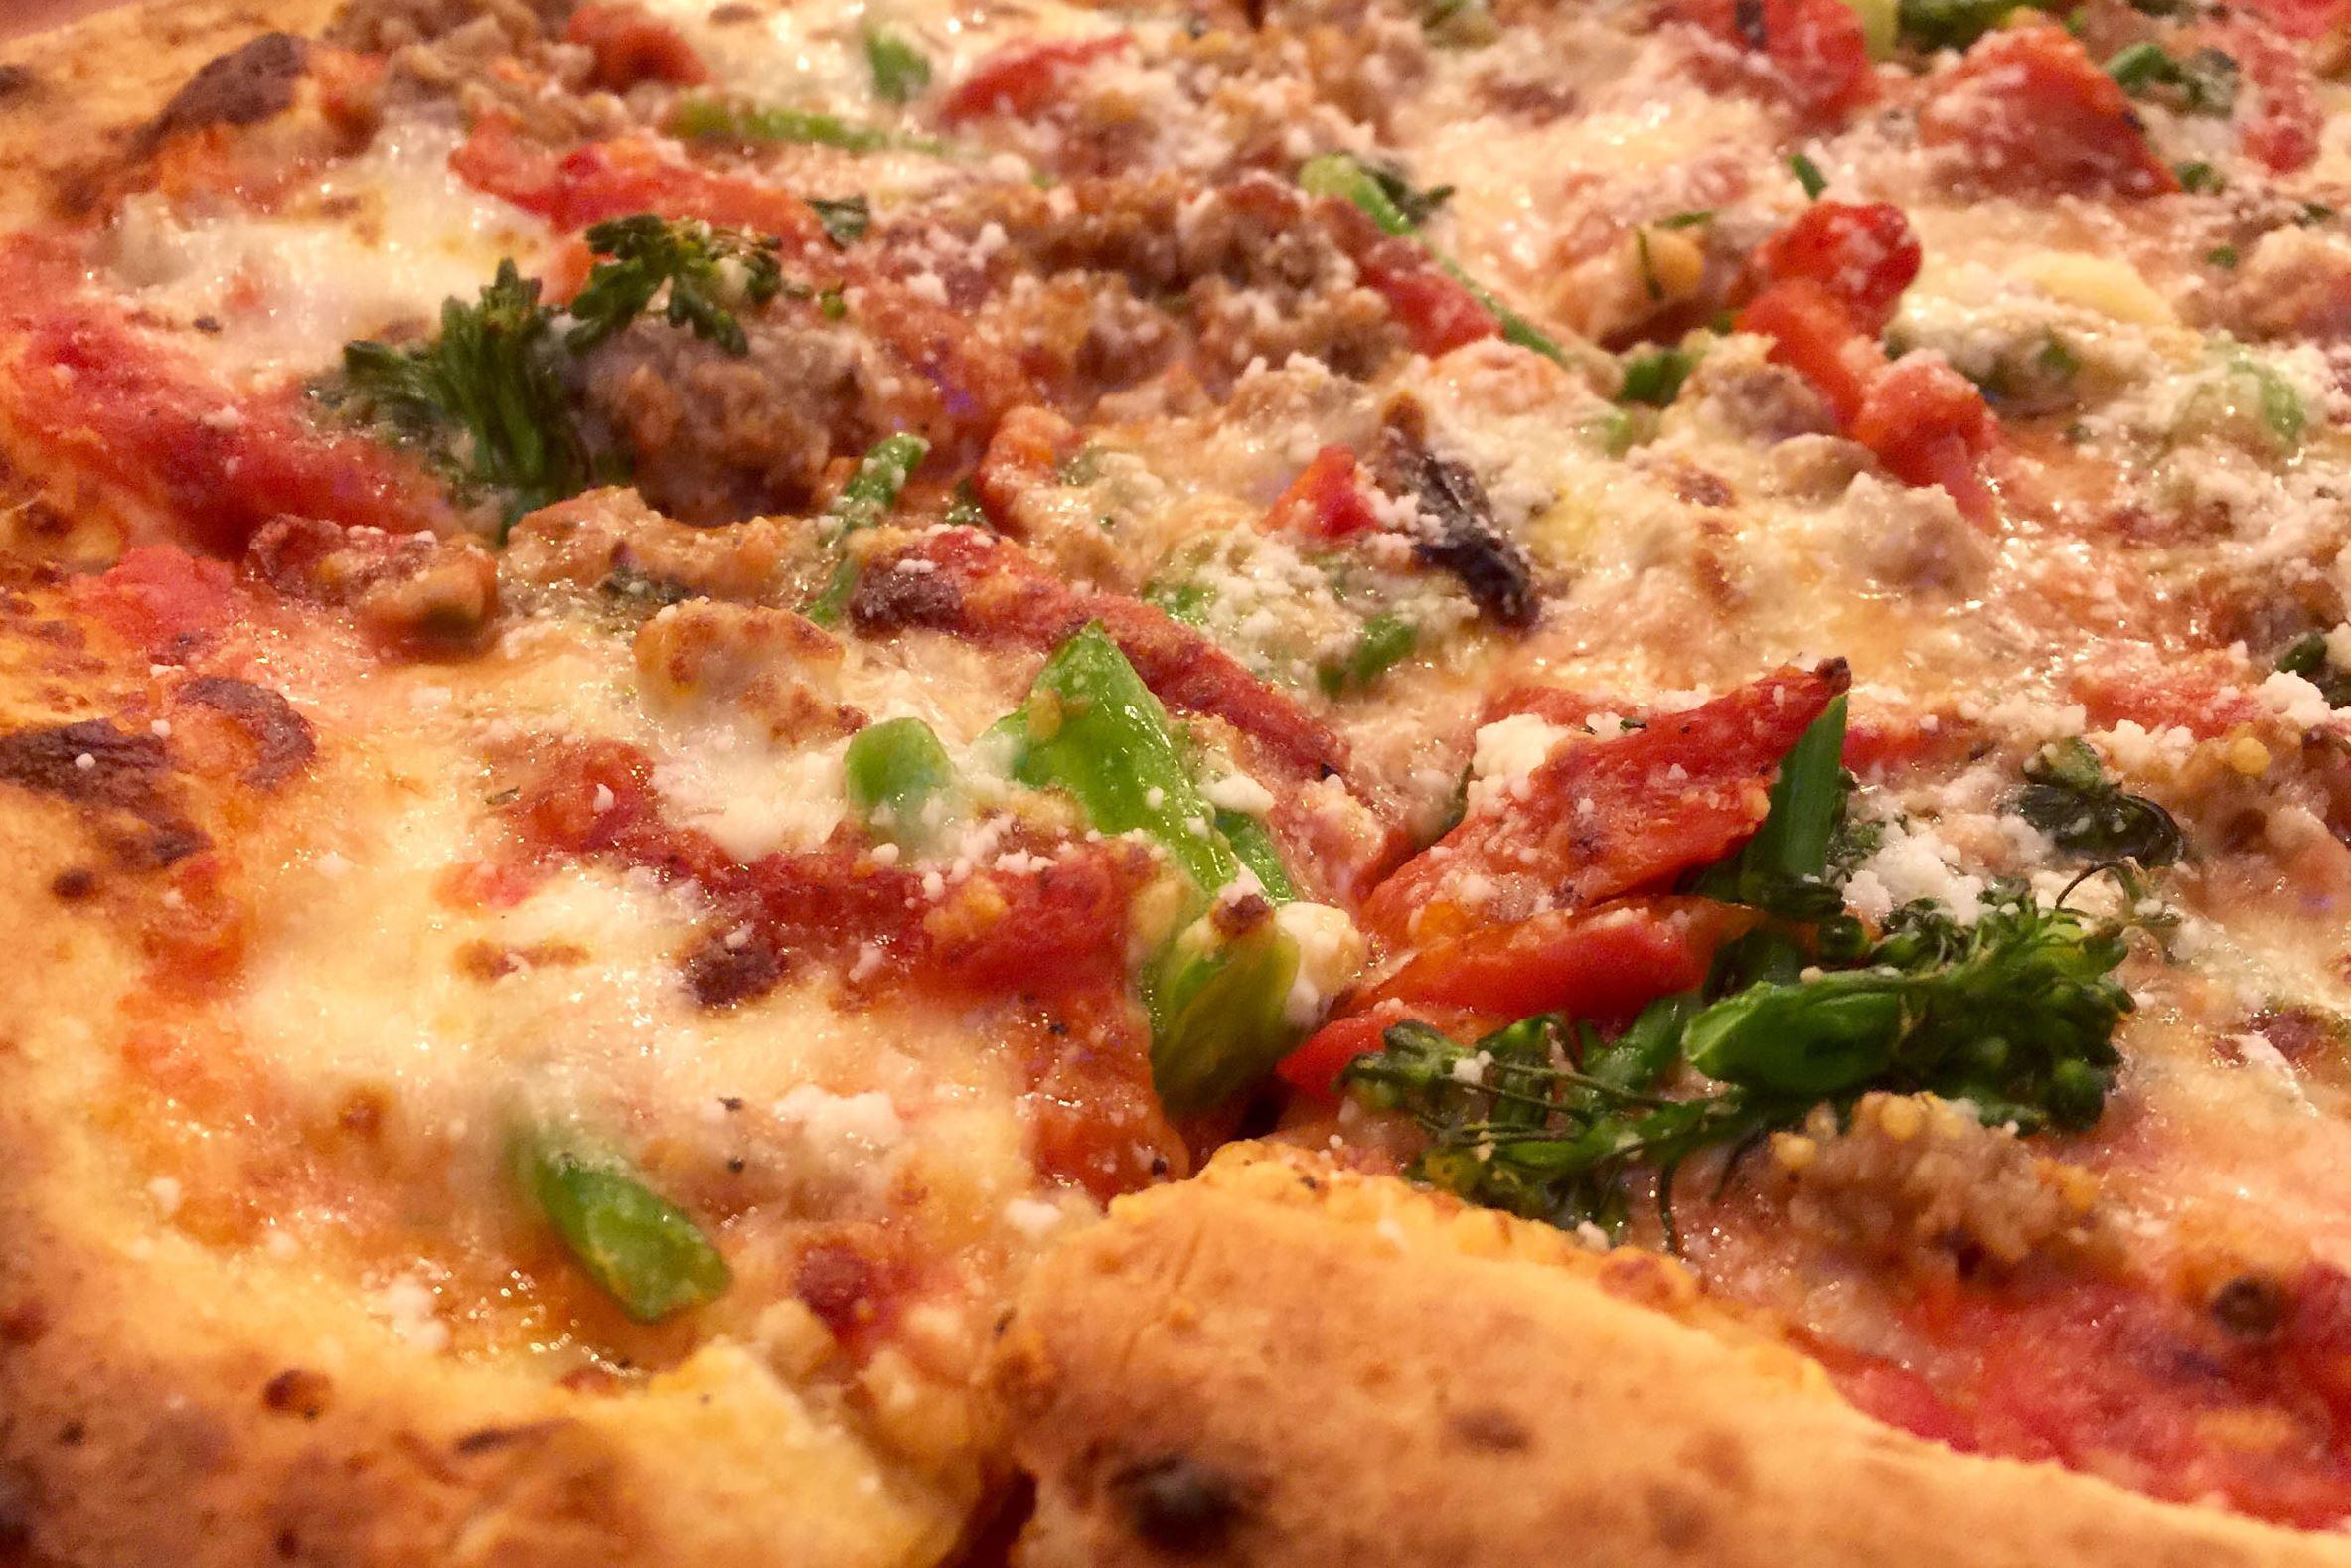 munch dal forno 01-1 The sausage and broccolini pizza at Dal Forno in North Huntington.